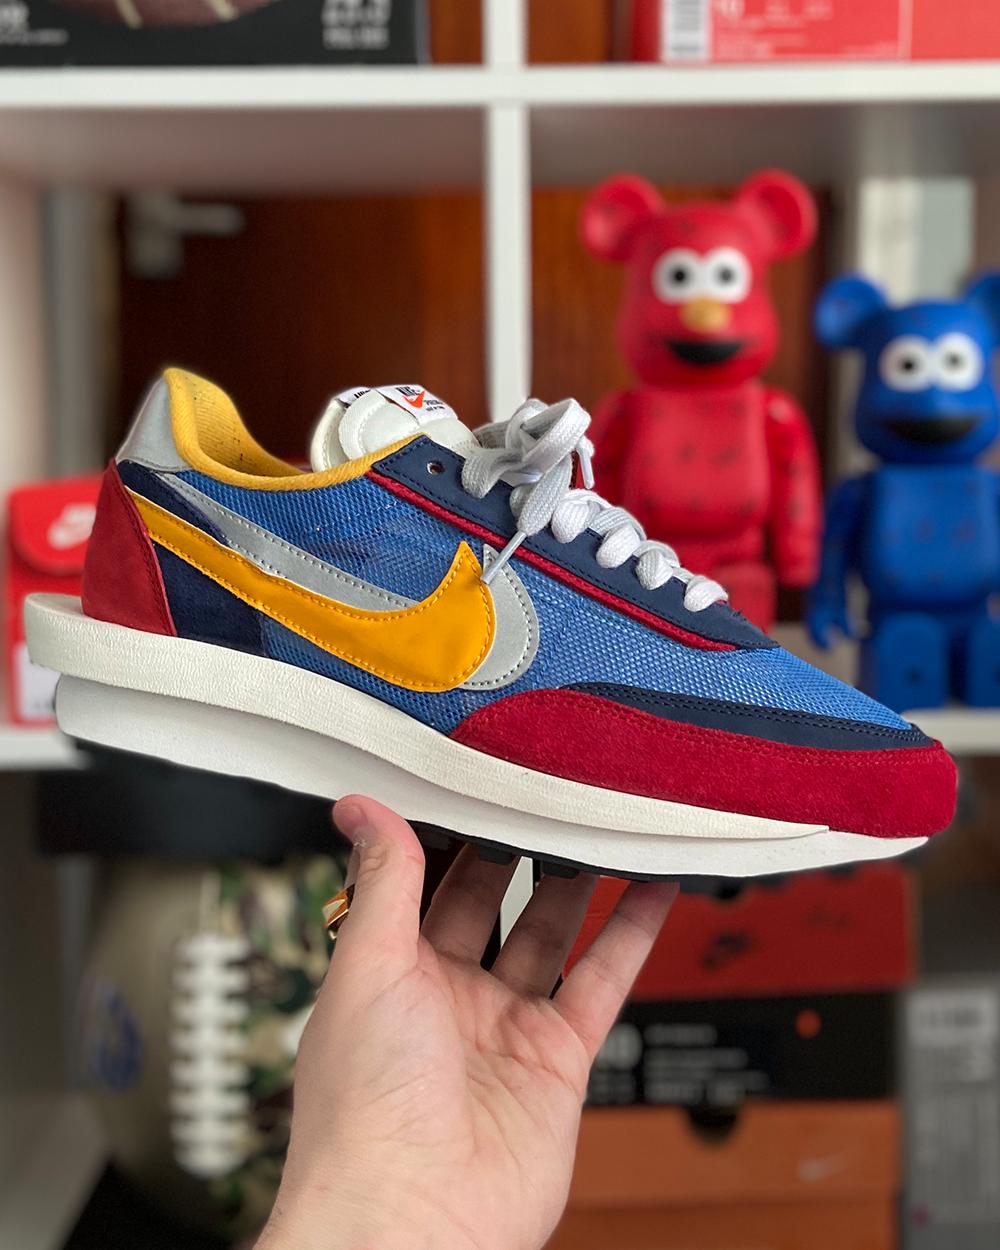 Nike x Sacai Waffle Trainer - 2019